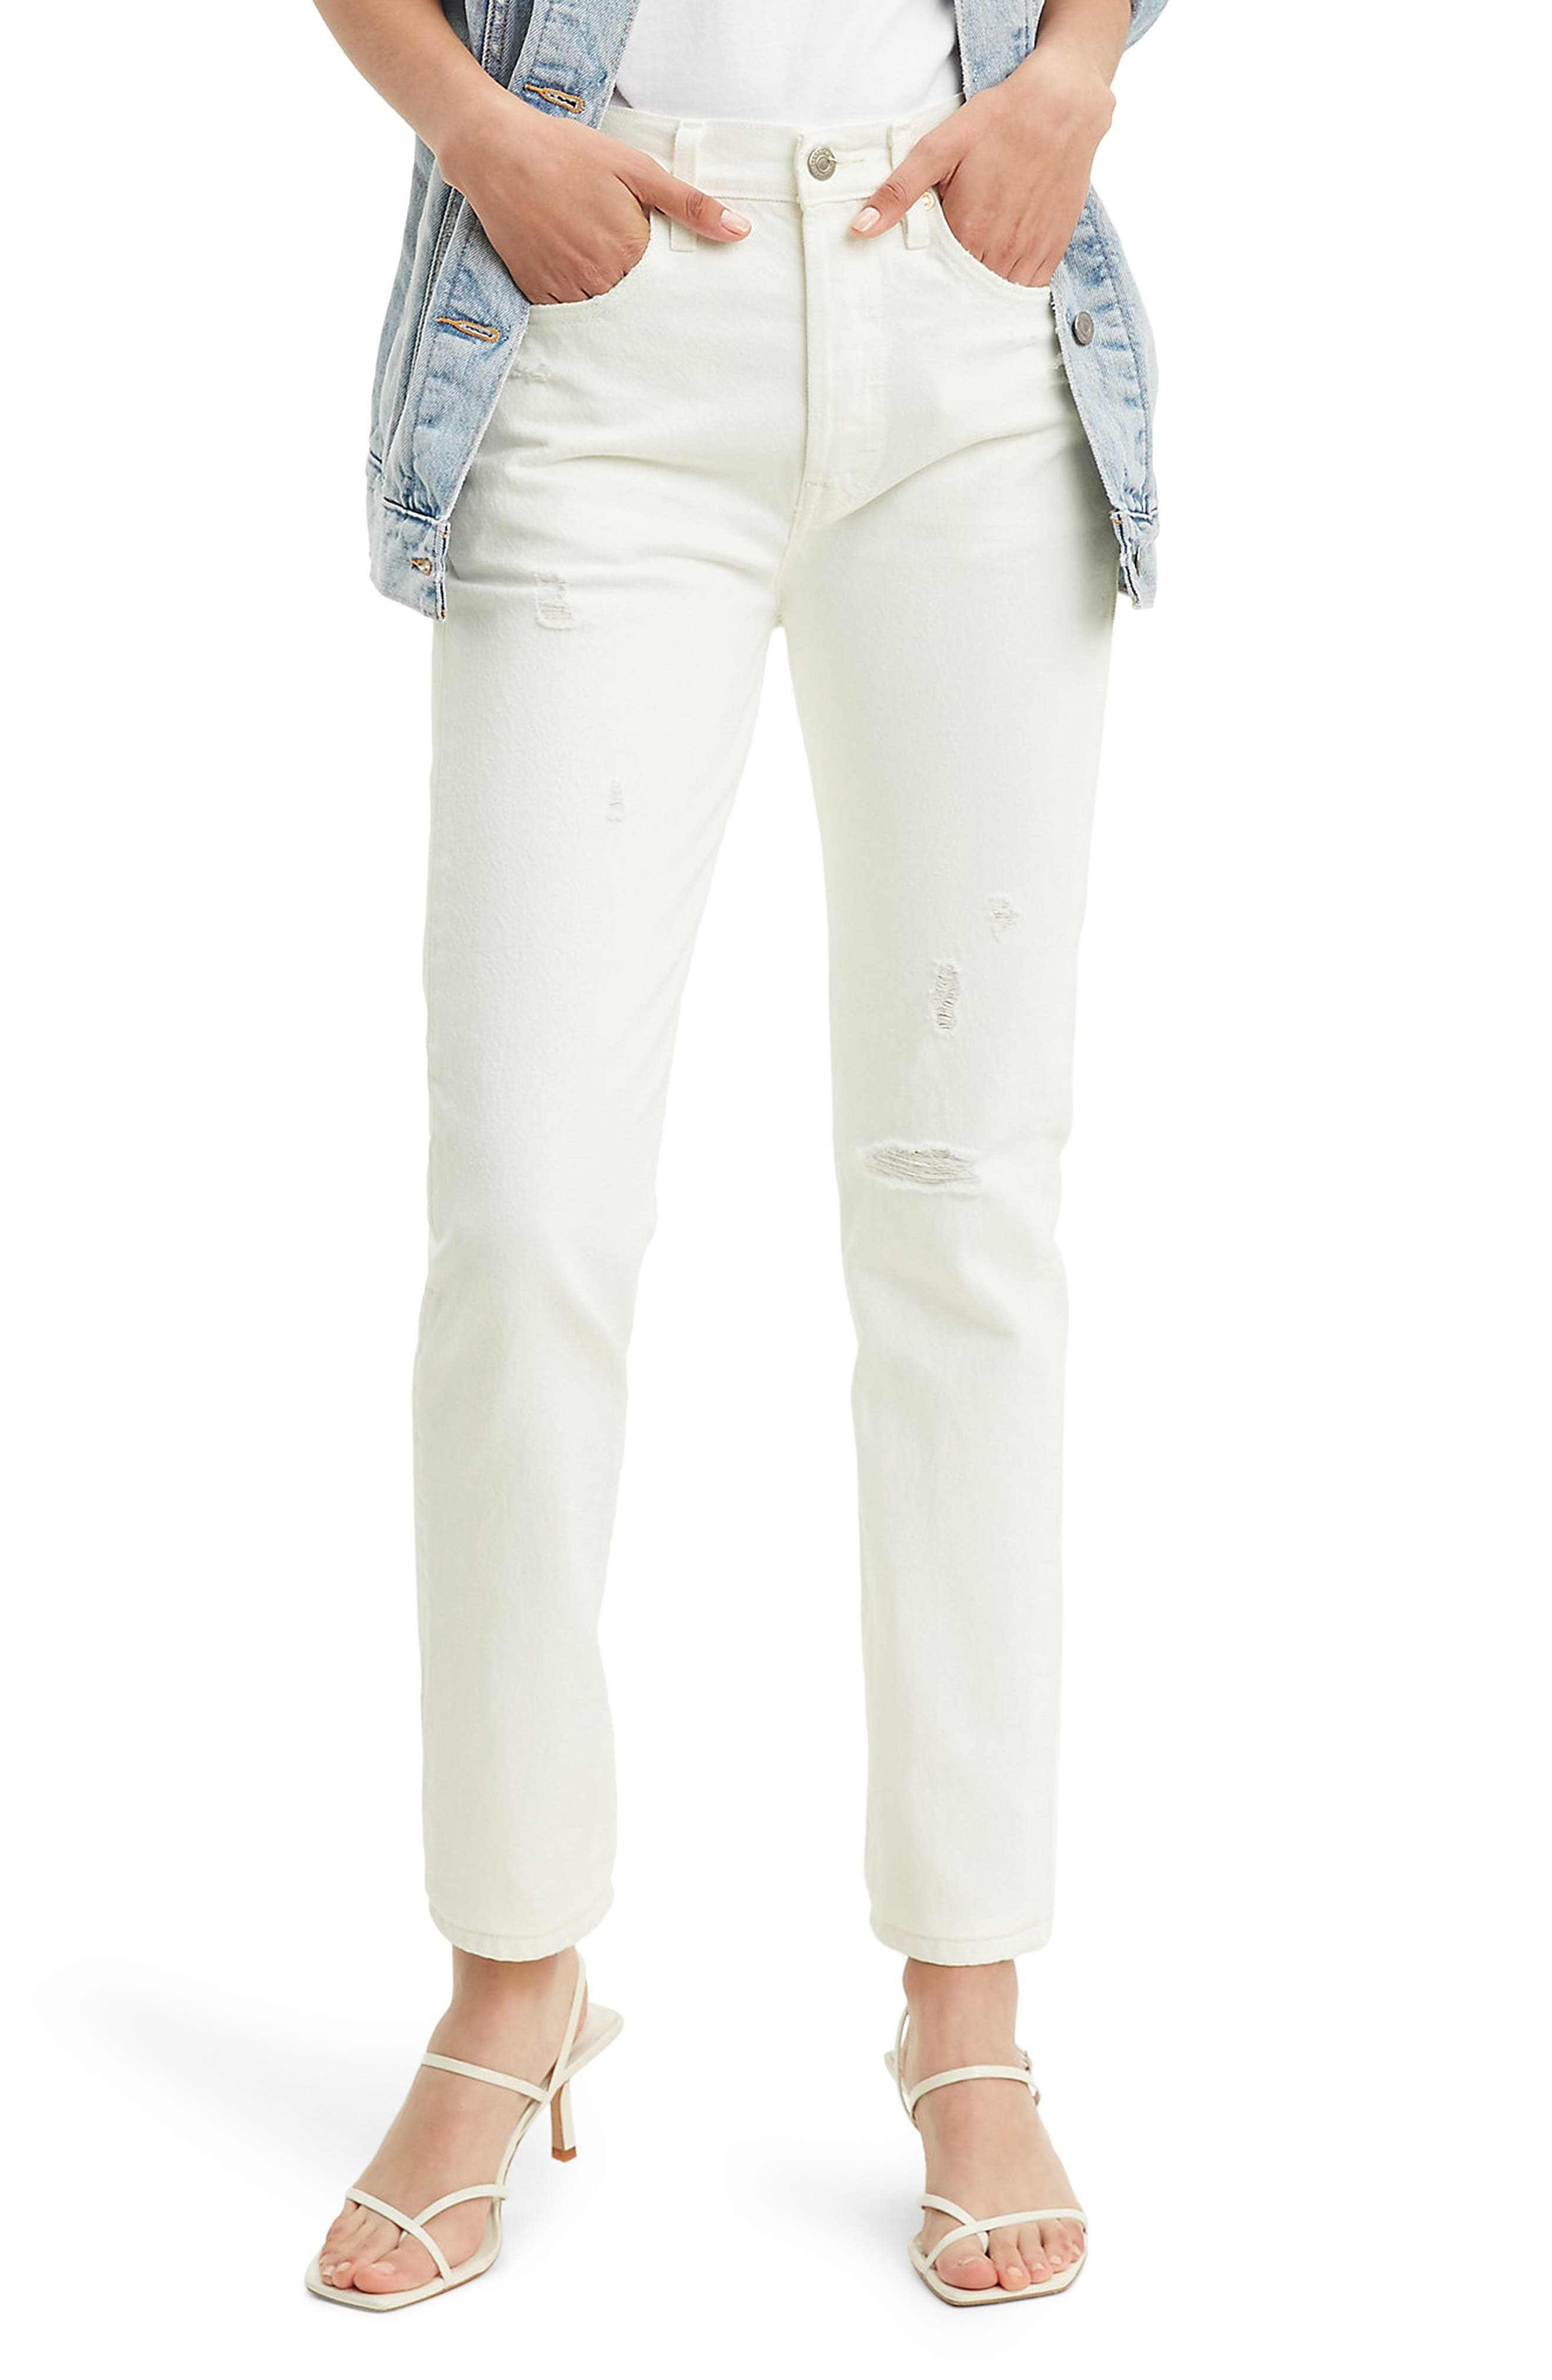 Women's Levi'S 501 Distressed High Waist Skinny Jeans,  32 x 28 - White